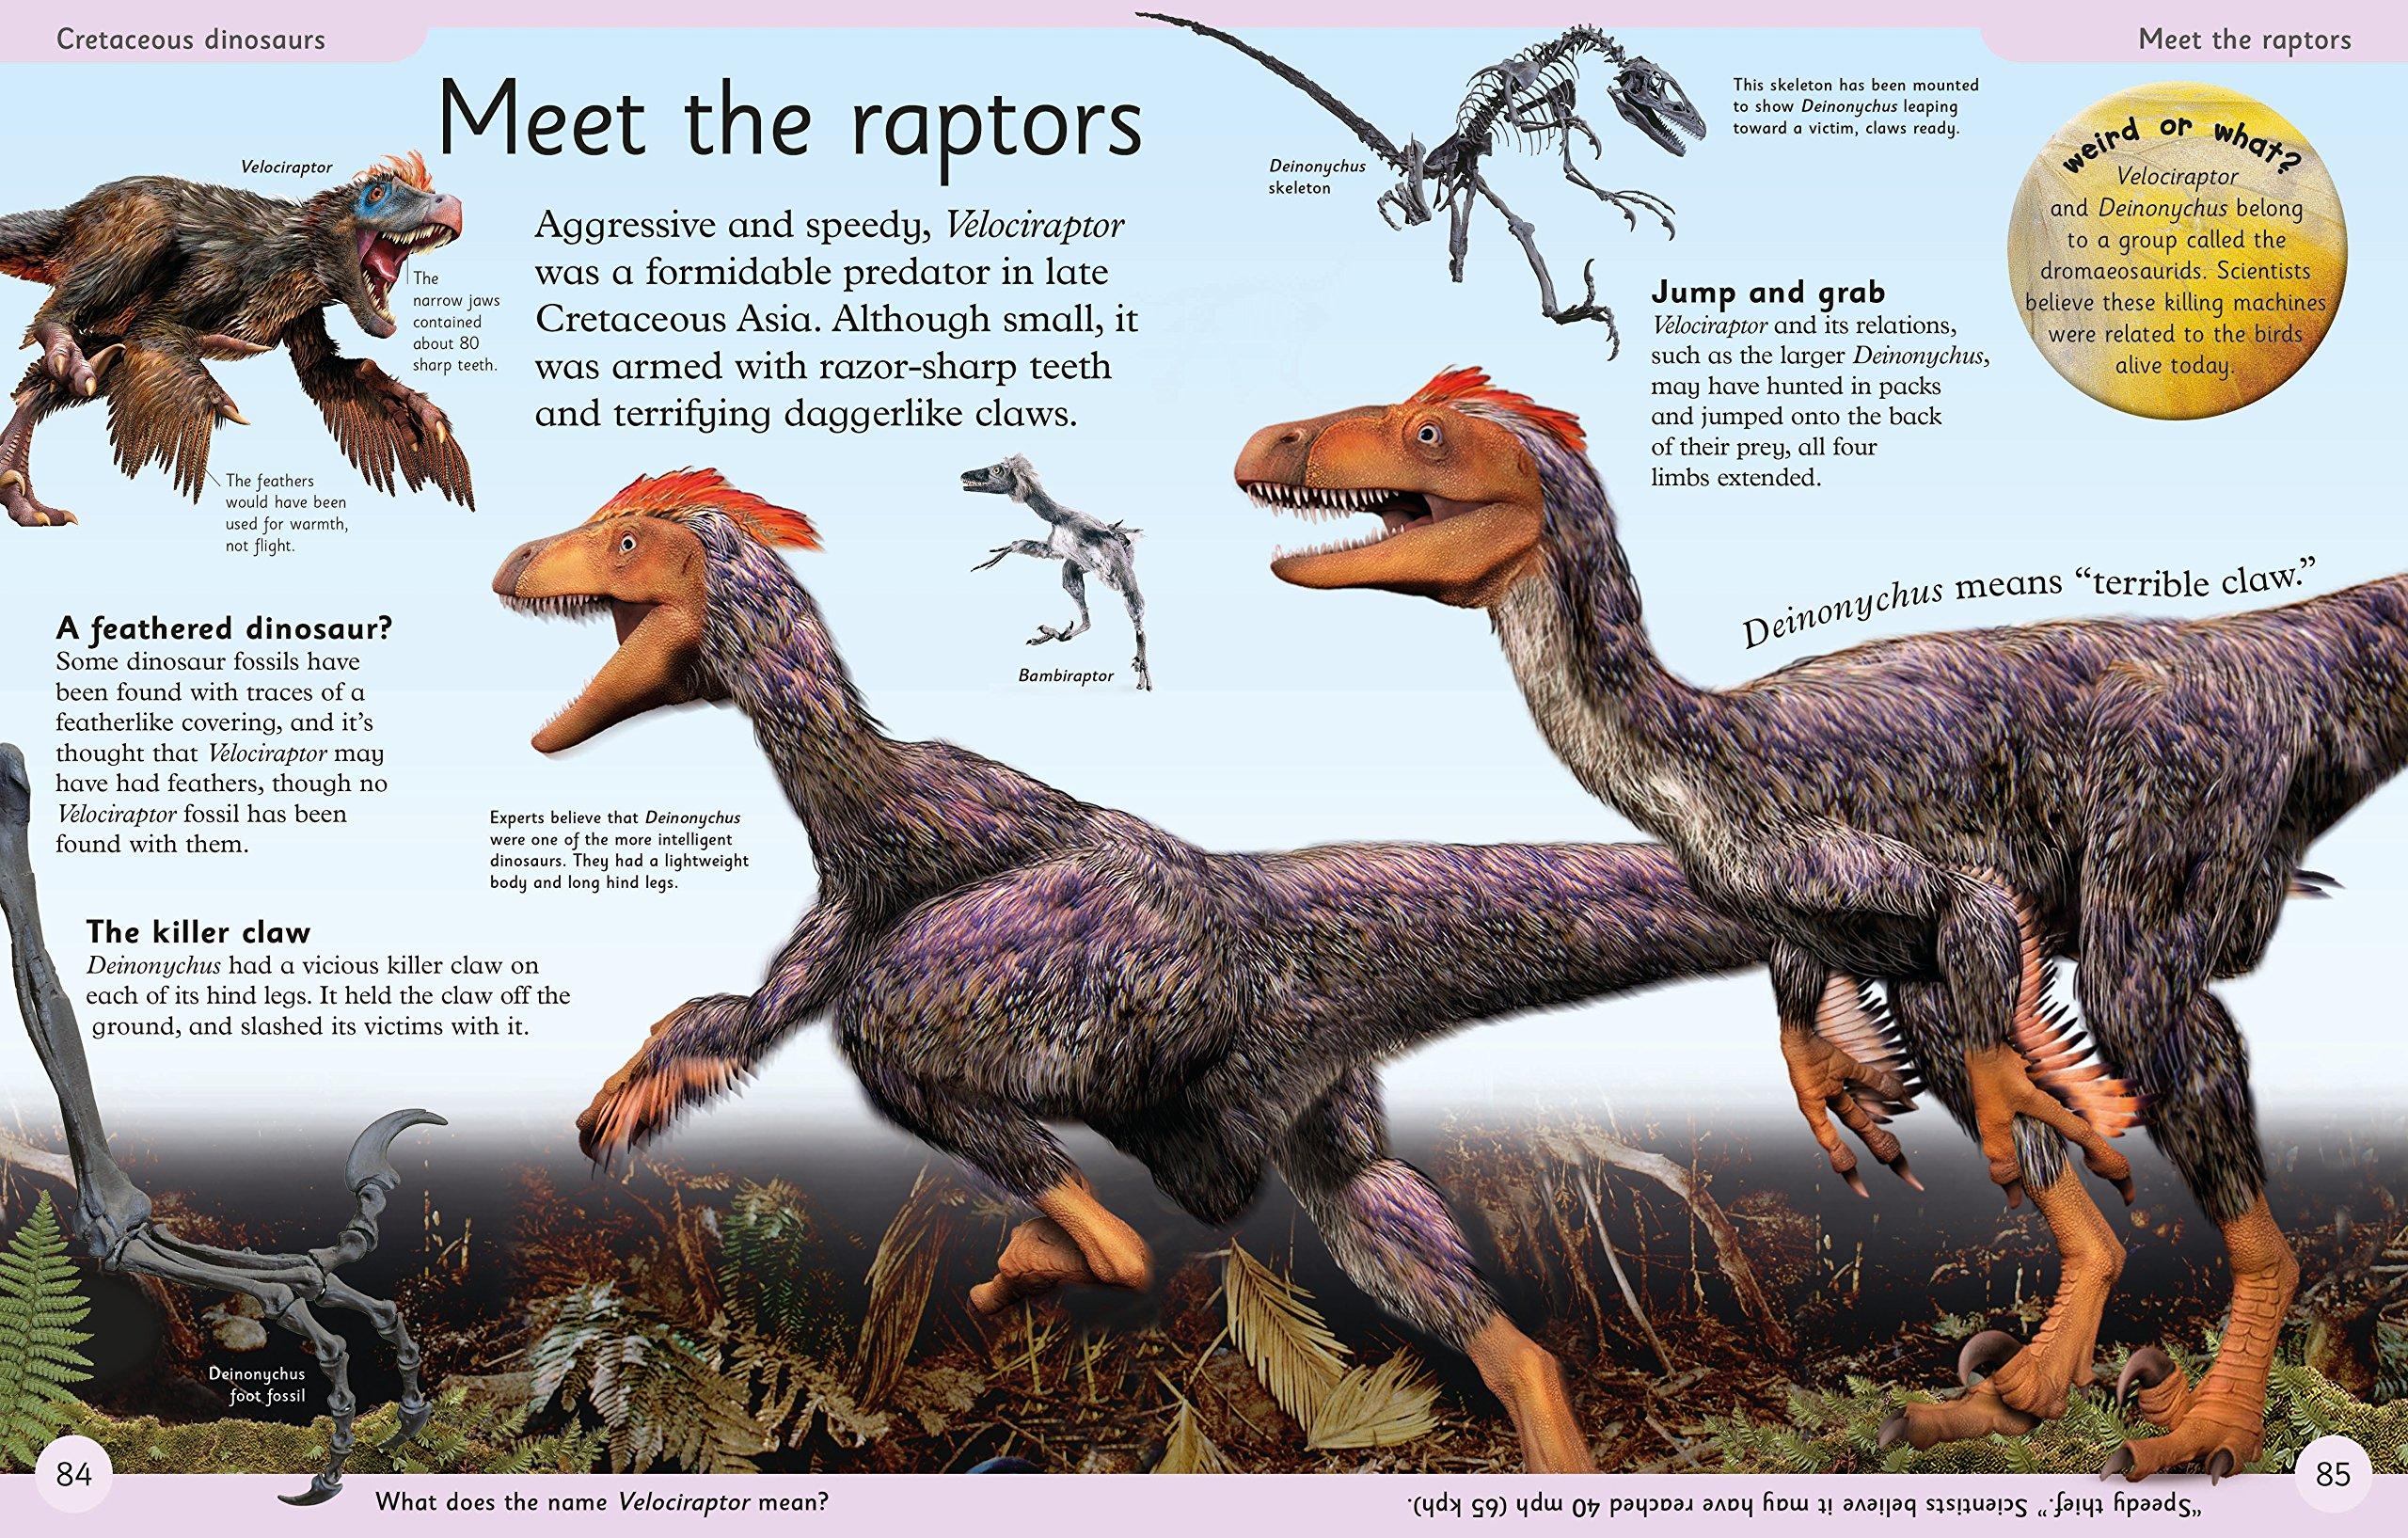 First Dinosaur Encyclopedia (DK First Reference) by DK Publishing Dorling Kindersley (Image #4)